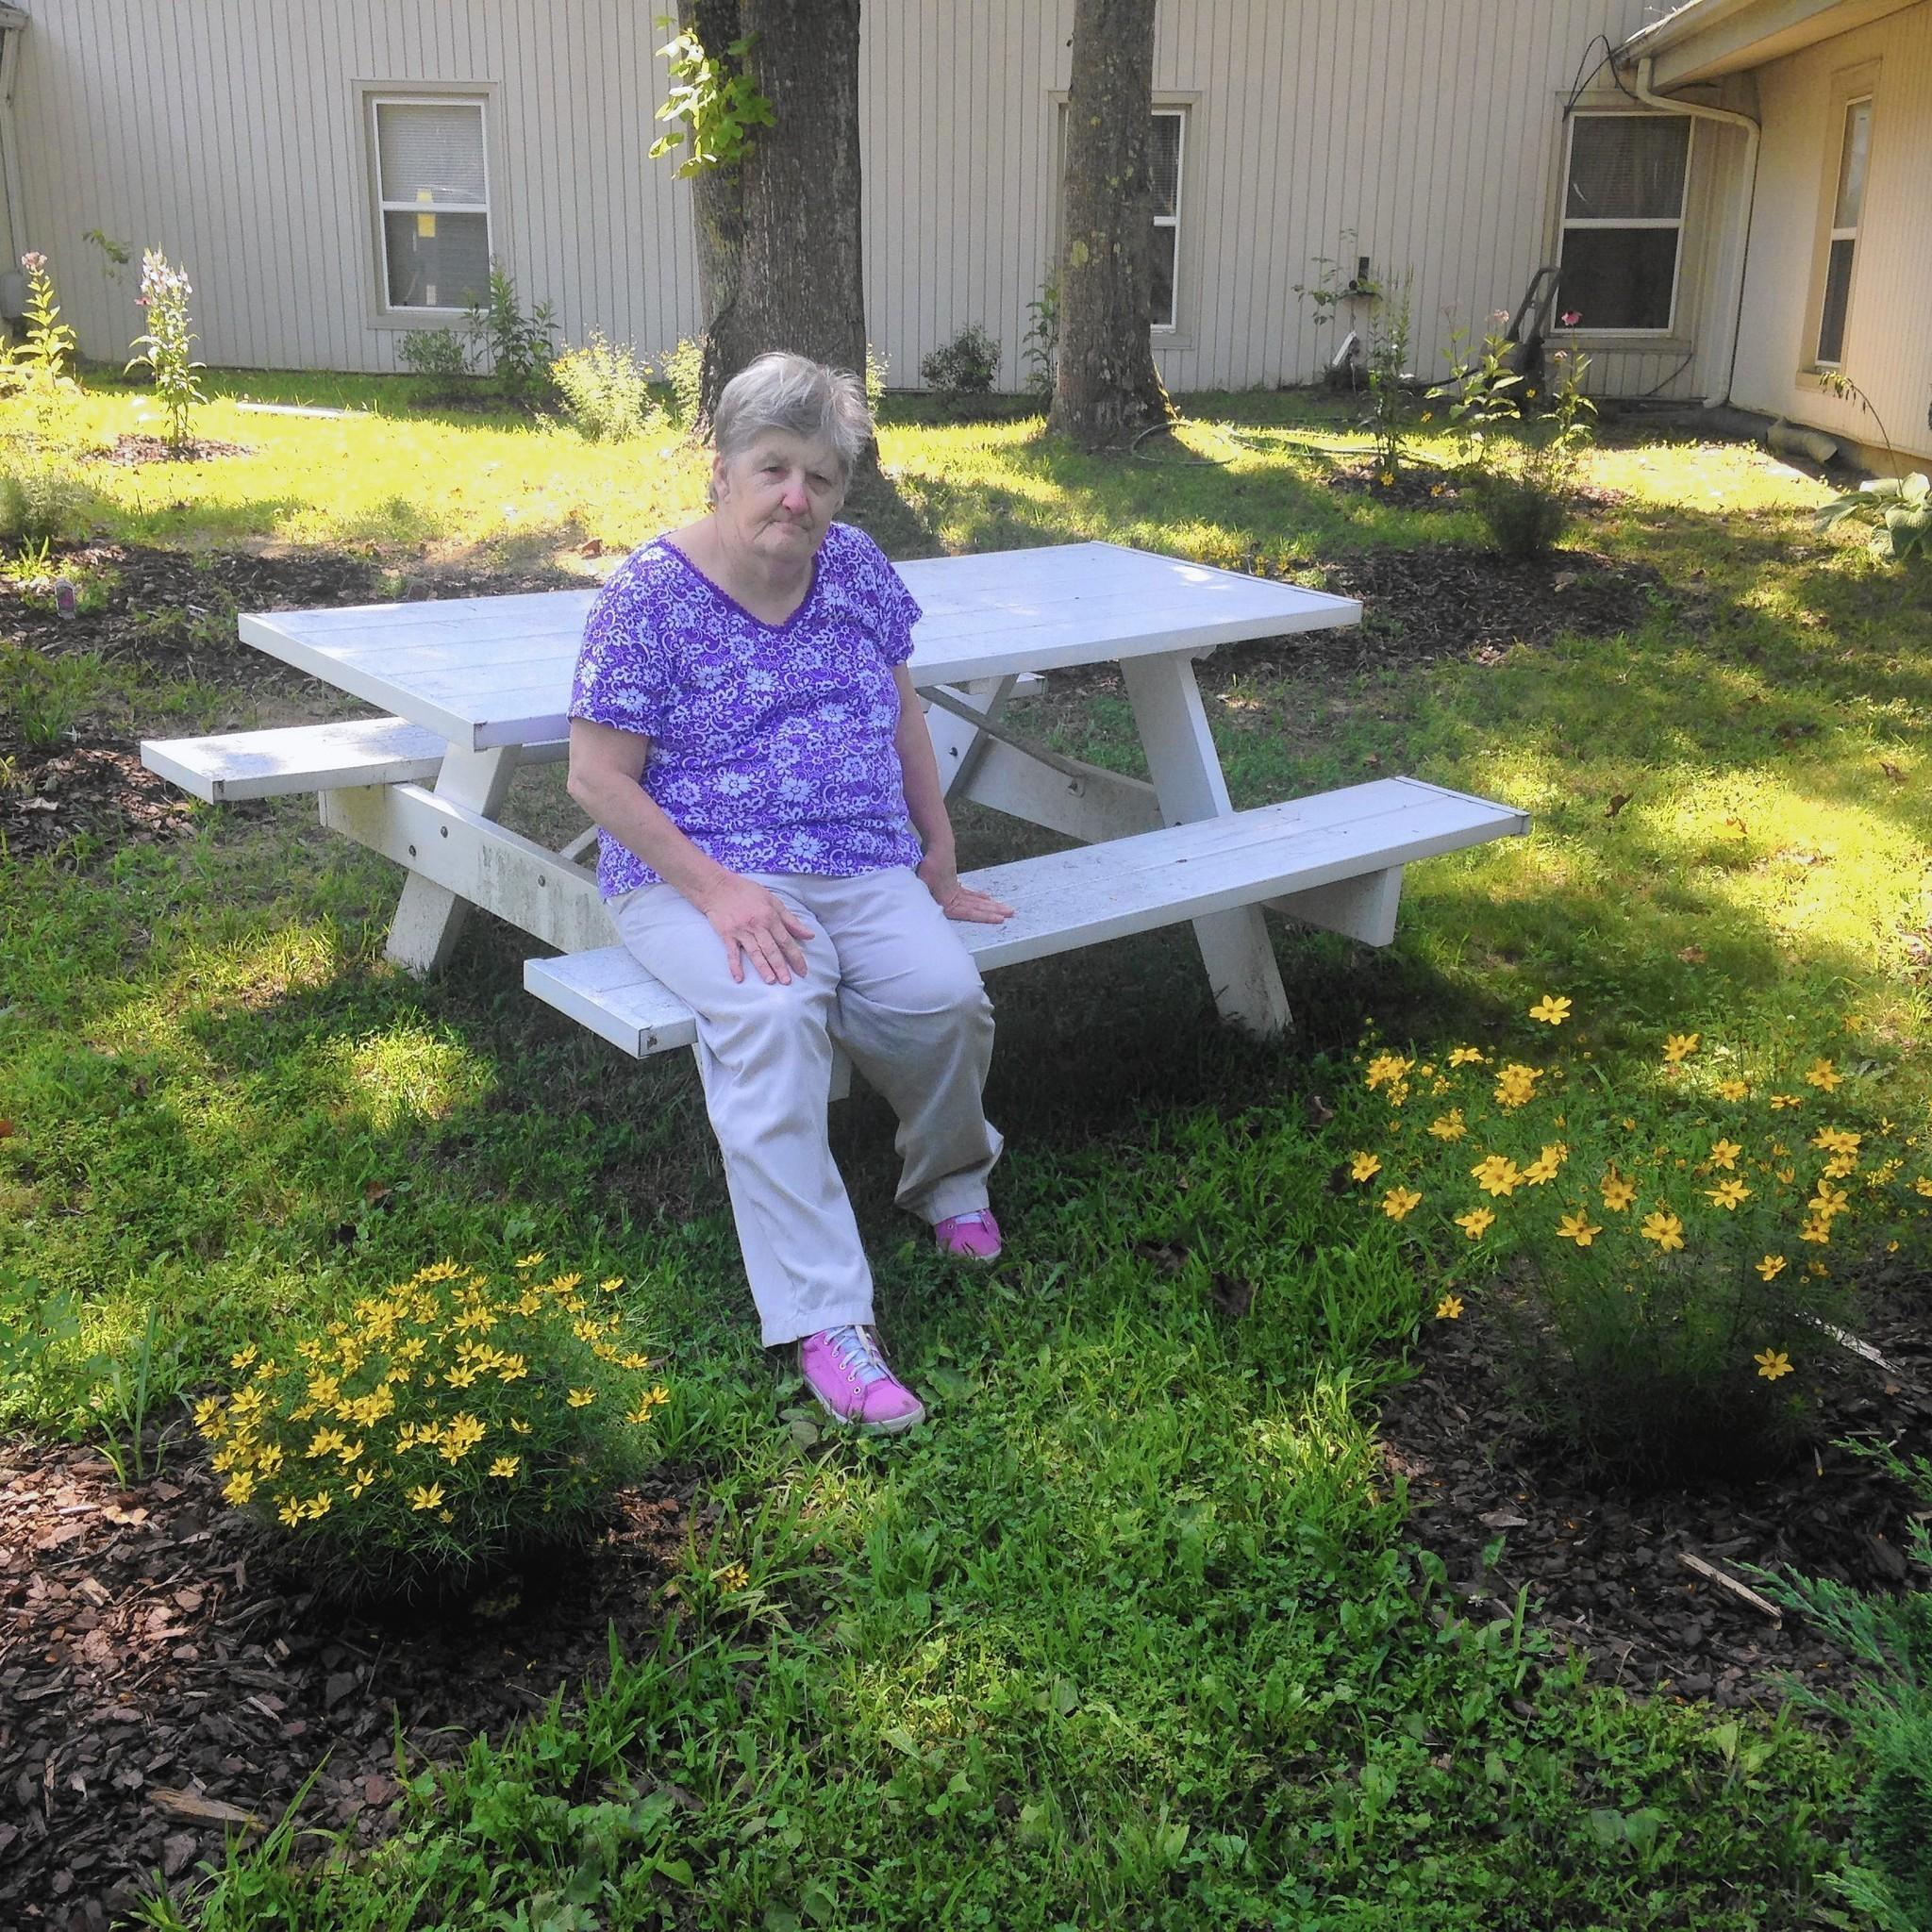 Around Annapolis: Relaxation Garden Brings Solace To Langton Green  Residents   Capital Gazette